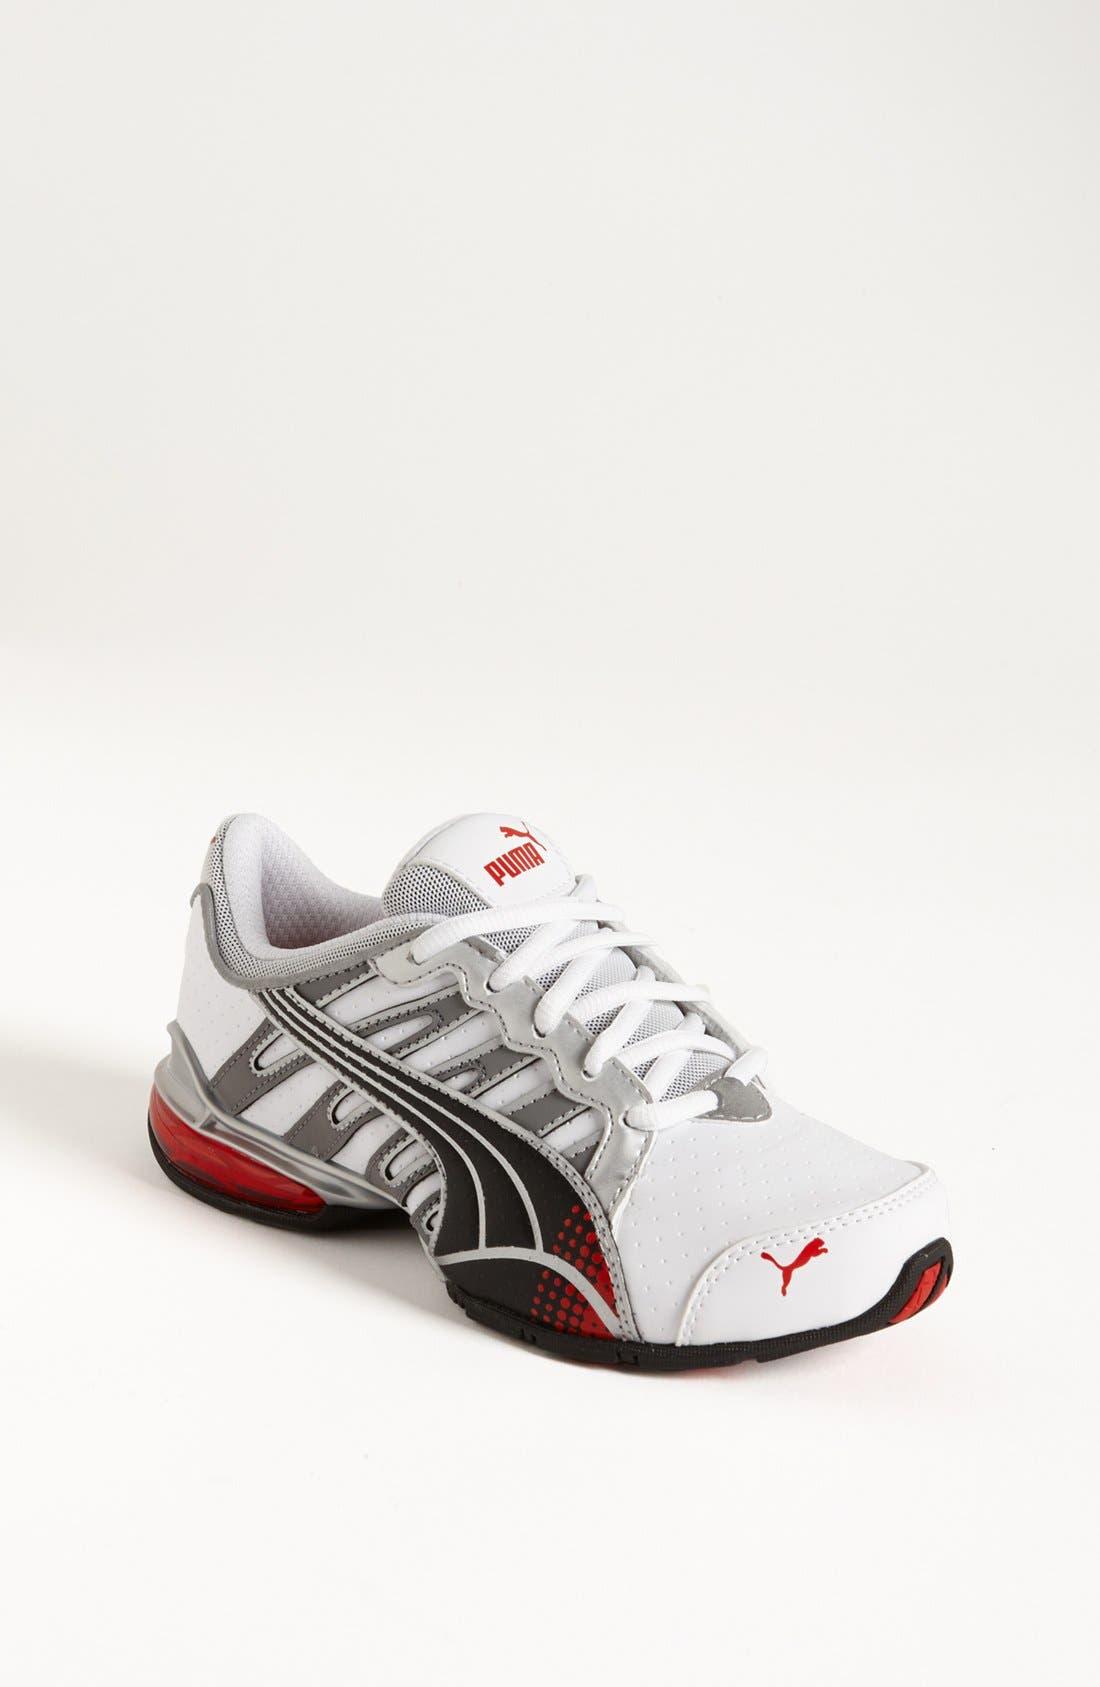 Alternate Image 1 Selected - PUMA 'Voltaic 3' Sneaker (Toddler, Little Kid & Big Kid)